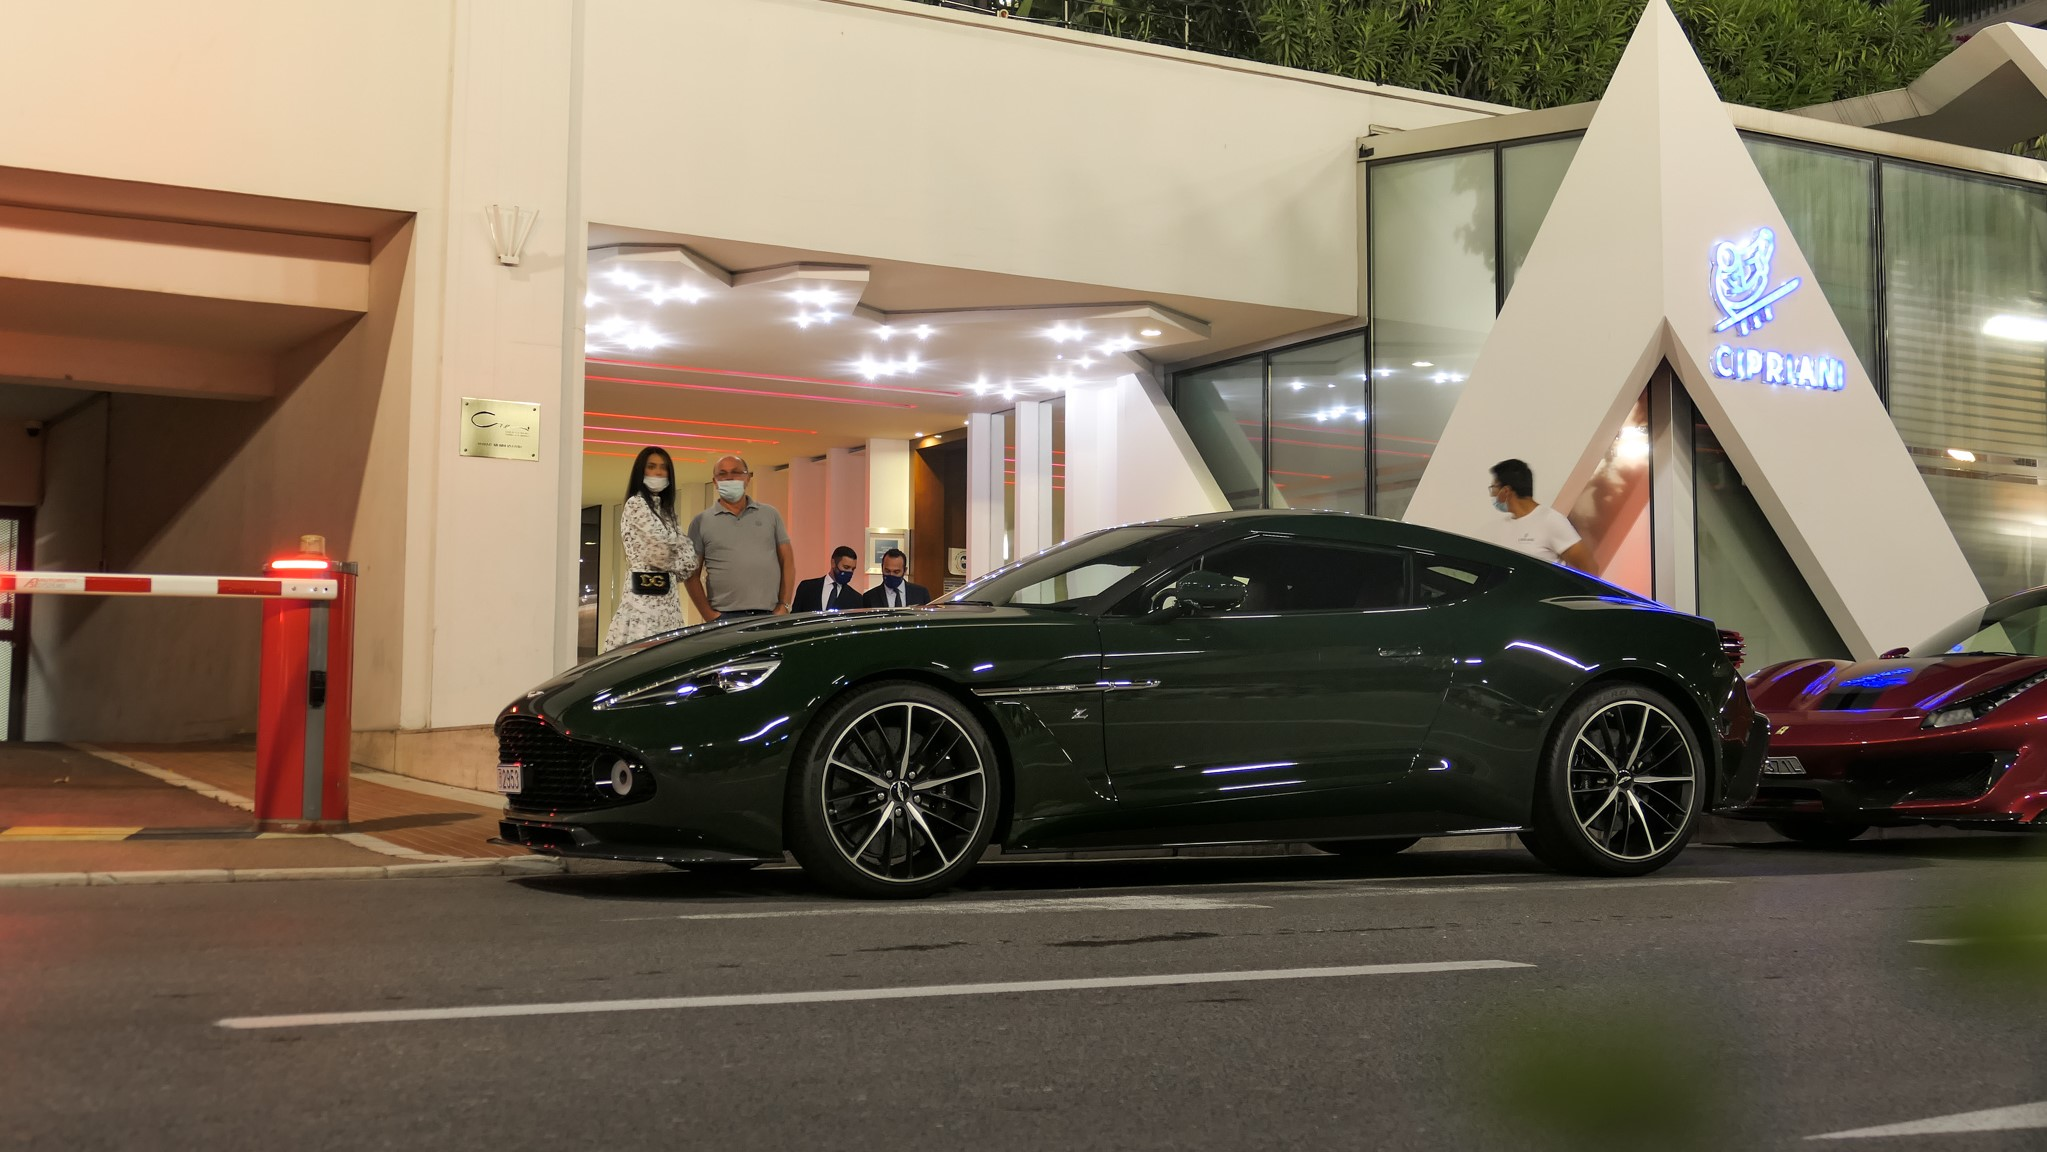 Aston Martin Vanquish Zagato - 2953 (MC)